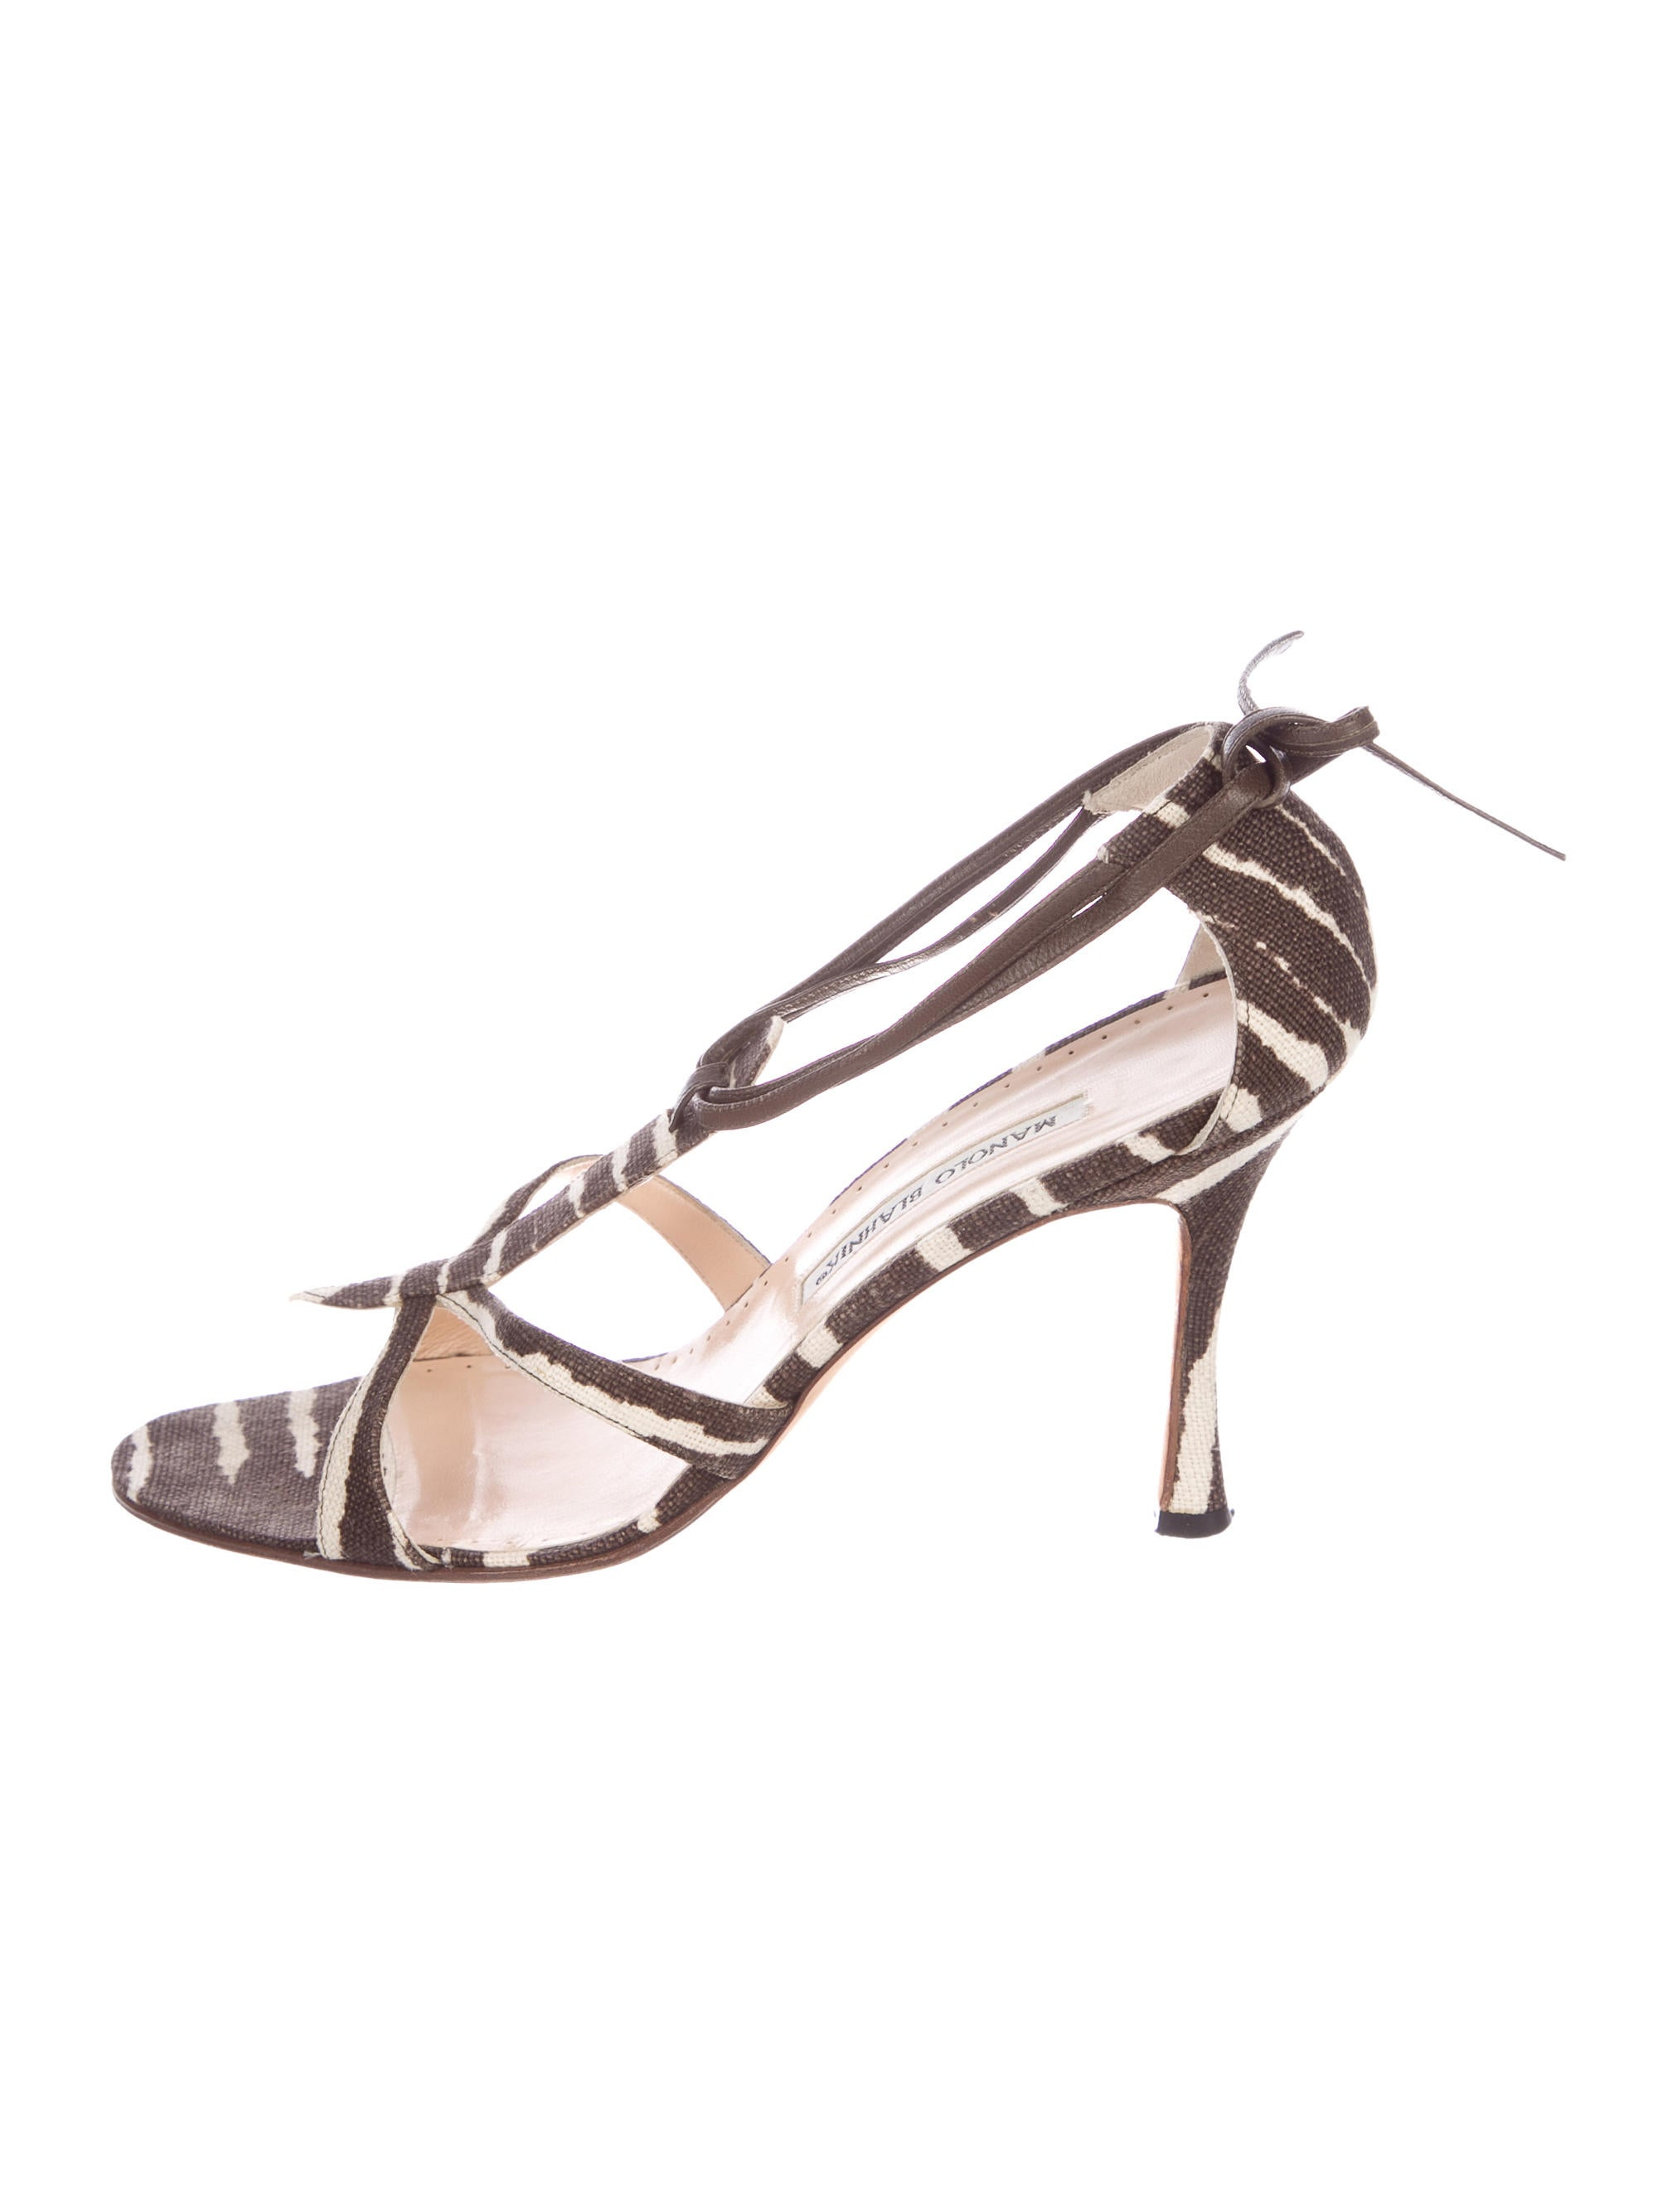 cheap discount sale Manolo Blahnik Canvas Multistrap Sandals buy cheap store buy cheap best store to get 7PS95BosRu